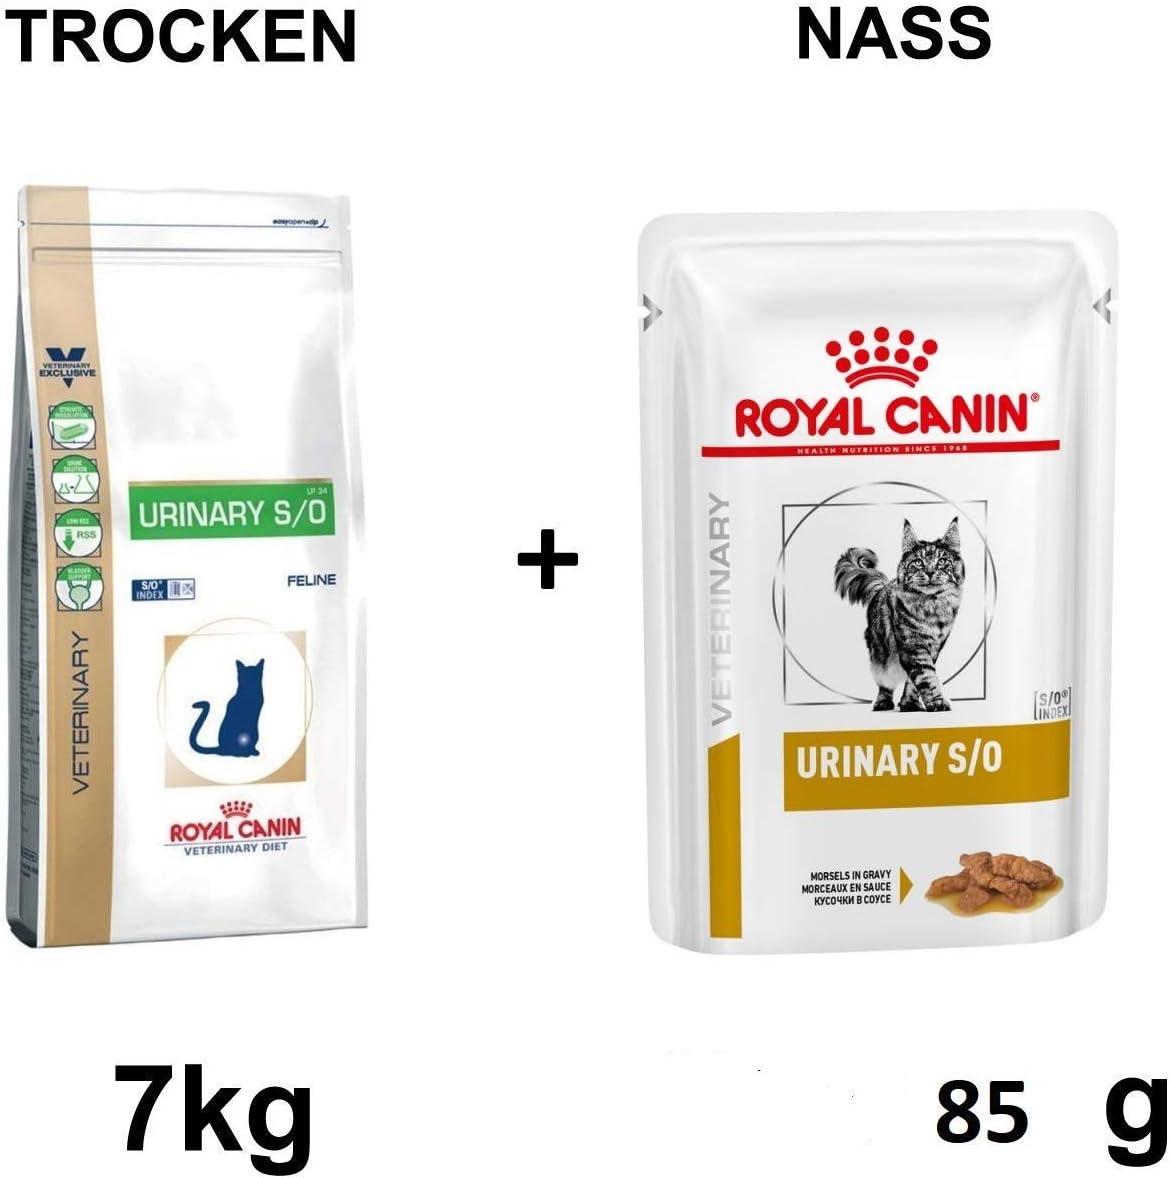 ROYAL CANIN Urinary S/o LP 34 7 kg + Gratis 100 g Gato Forro ...